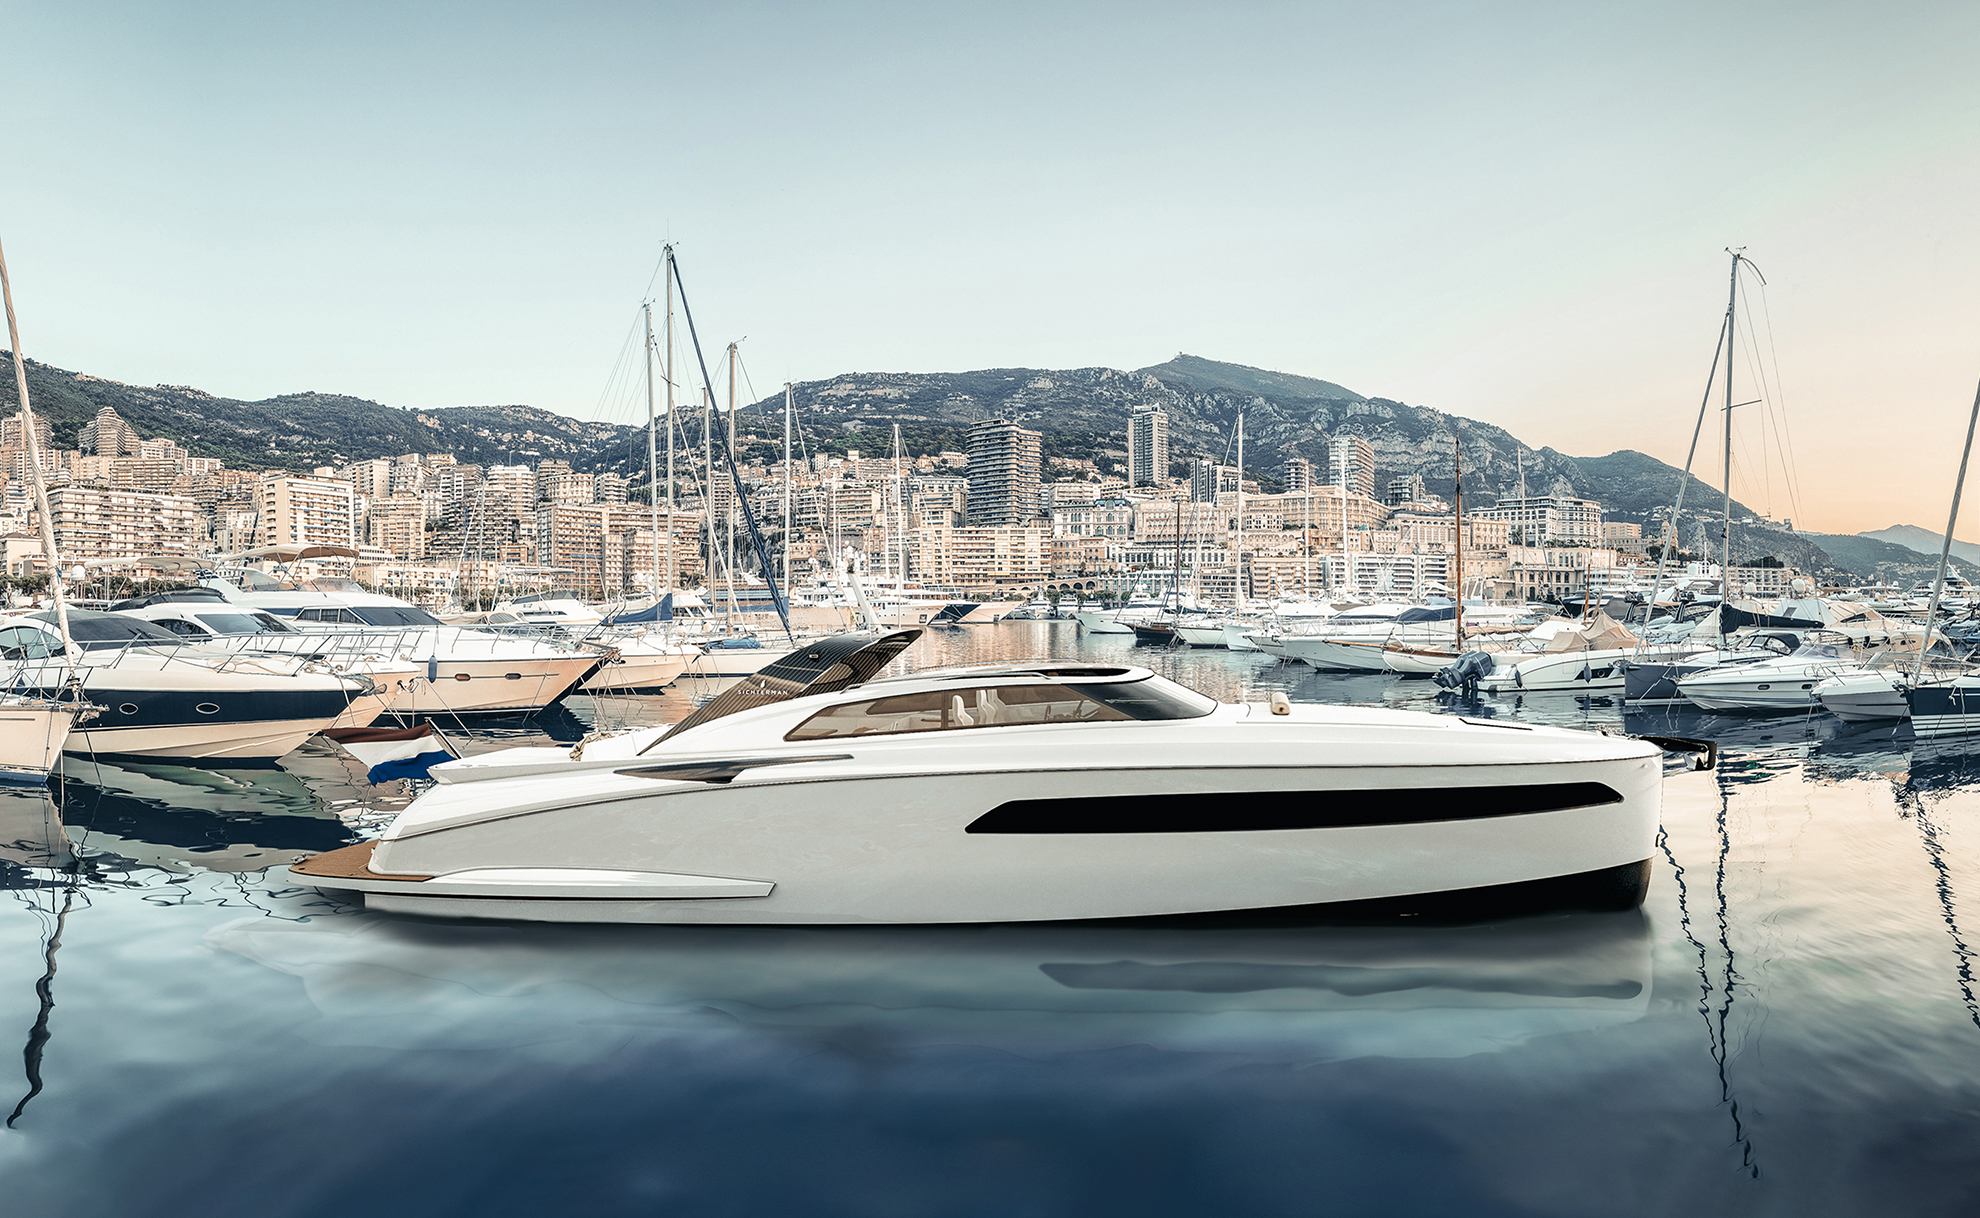 Sichterman Libertas 15M tender Supery achts Monaco